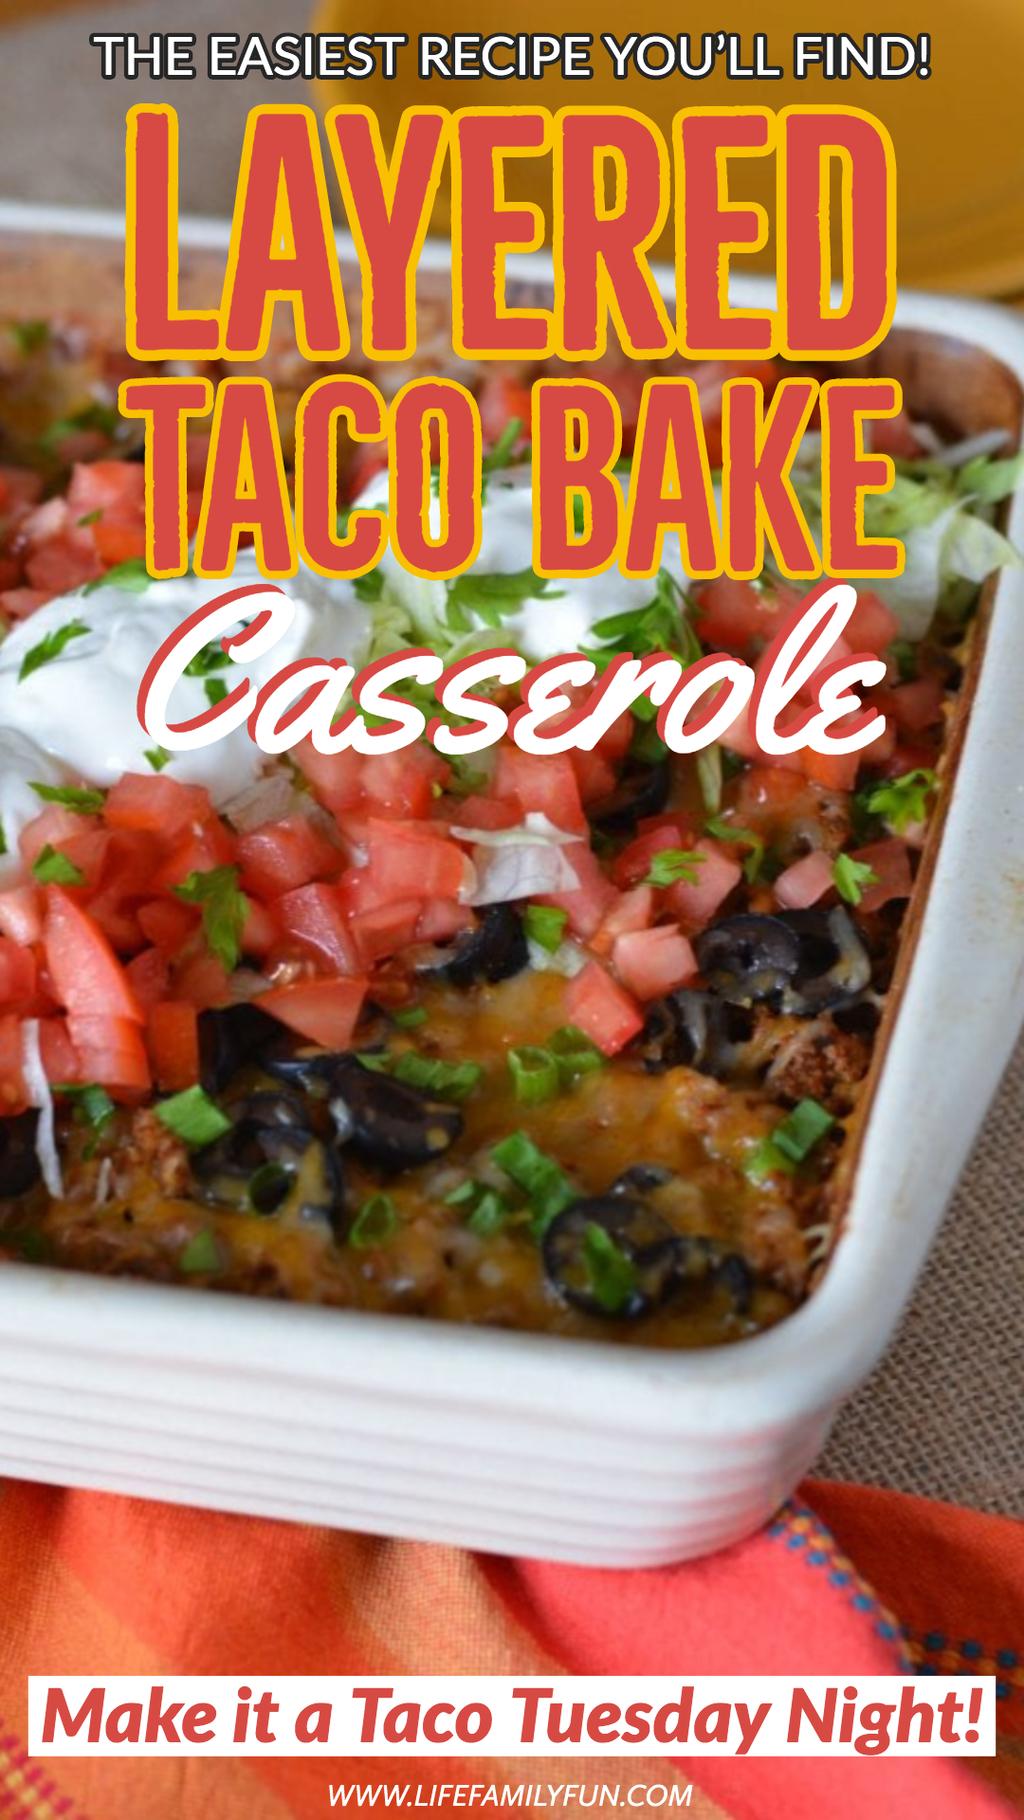 Pin for Taco Bake Casserole Recipe